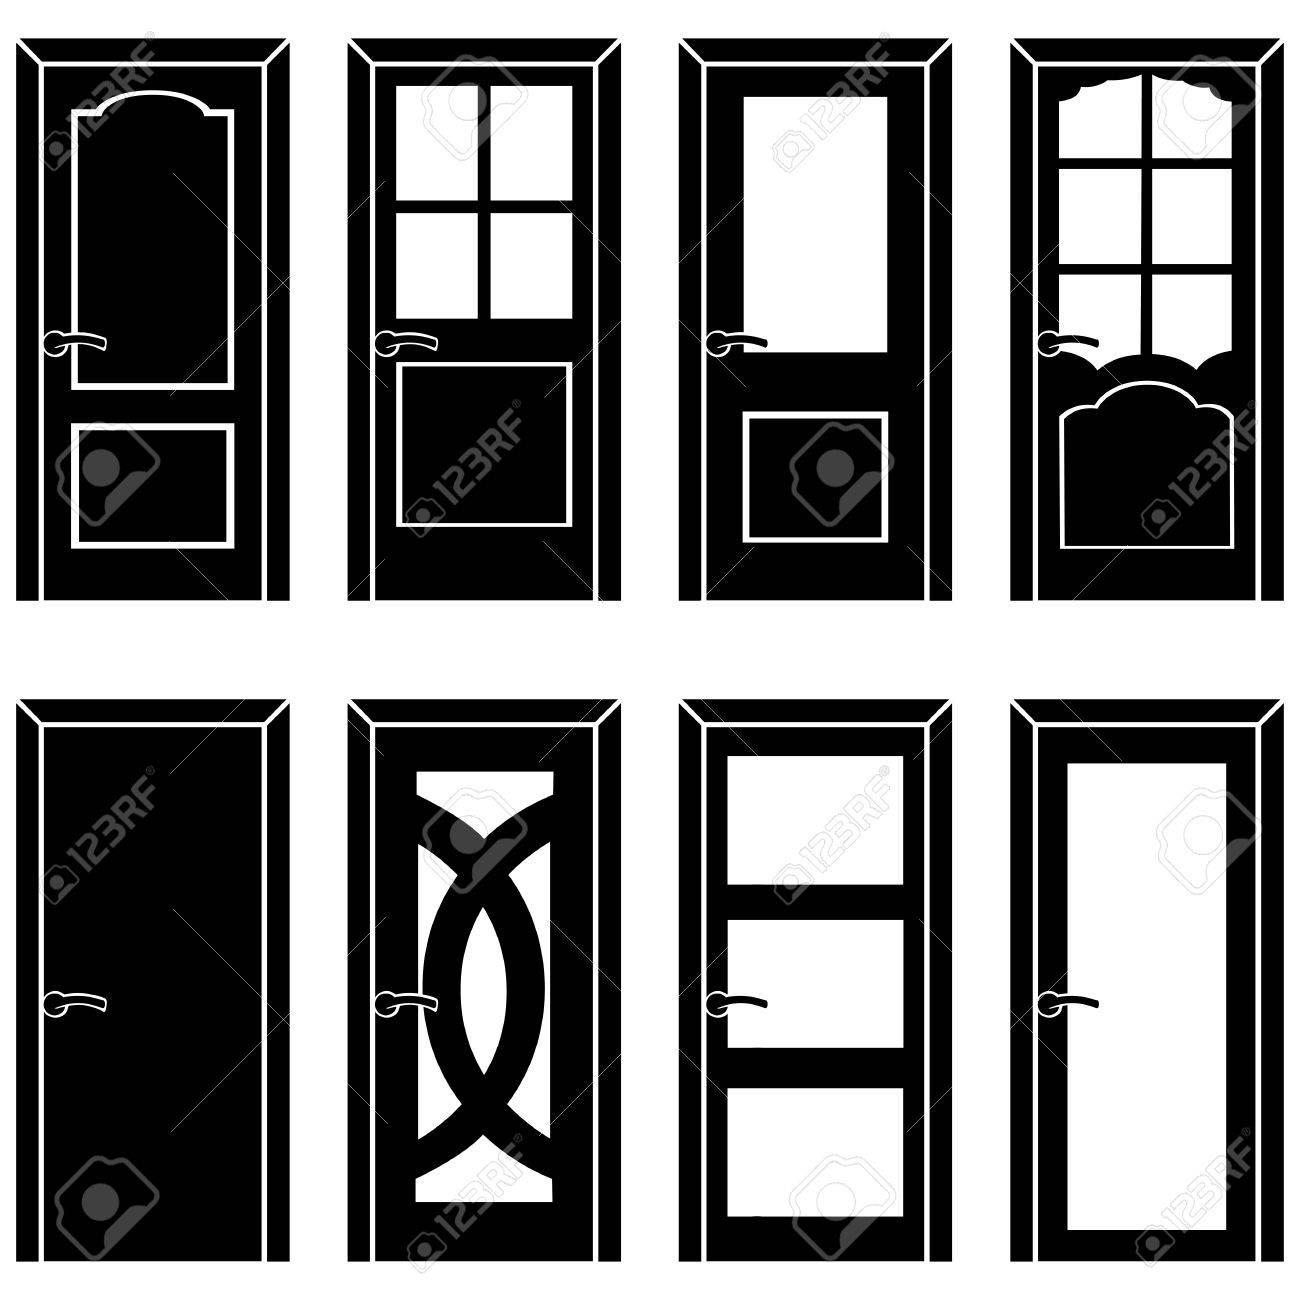 vector set of 8 Black door icons Stock Vector - 62073710  sc 1 st  123RF Stock Photos & Vector Set Of 8 Black Door Icons Royalty Free Cliparts Vectors ... pezcame.com